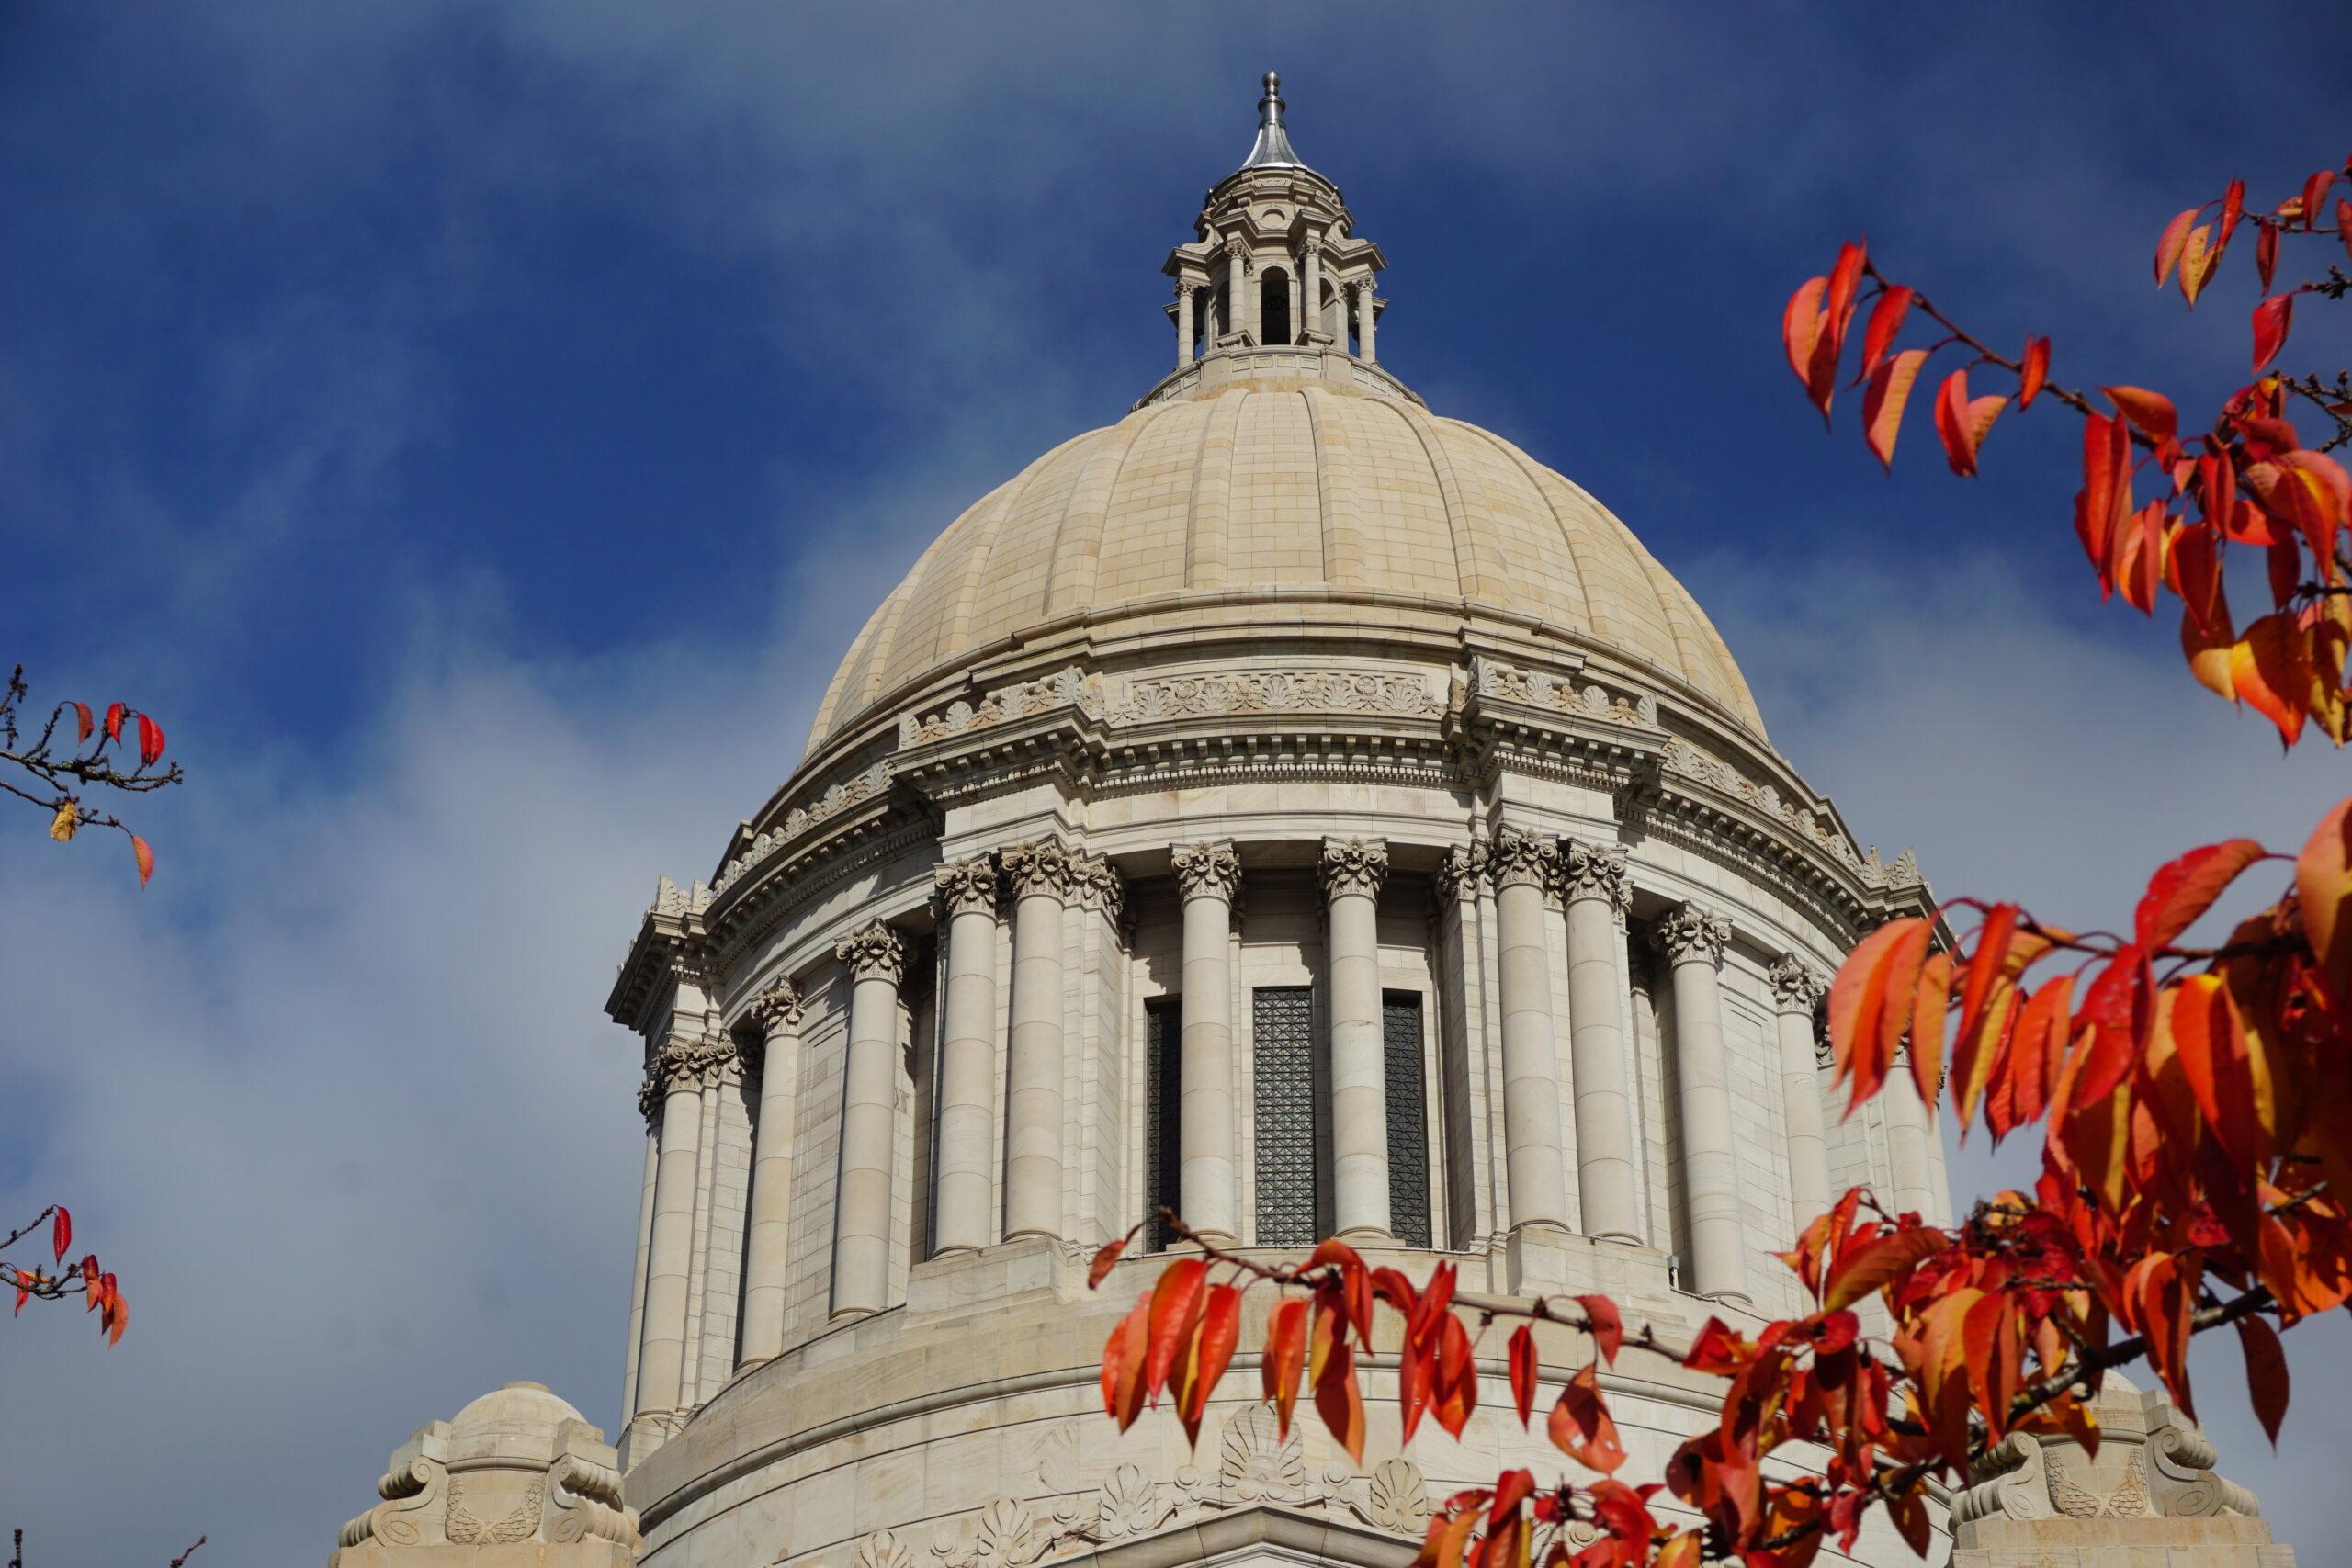 Legislative Building dome